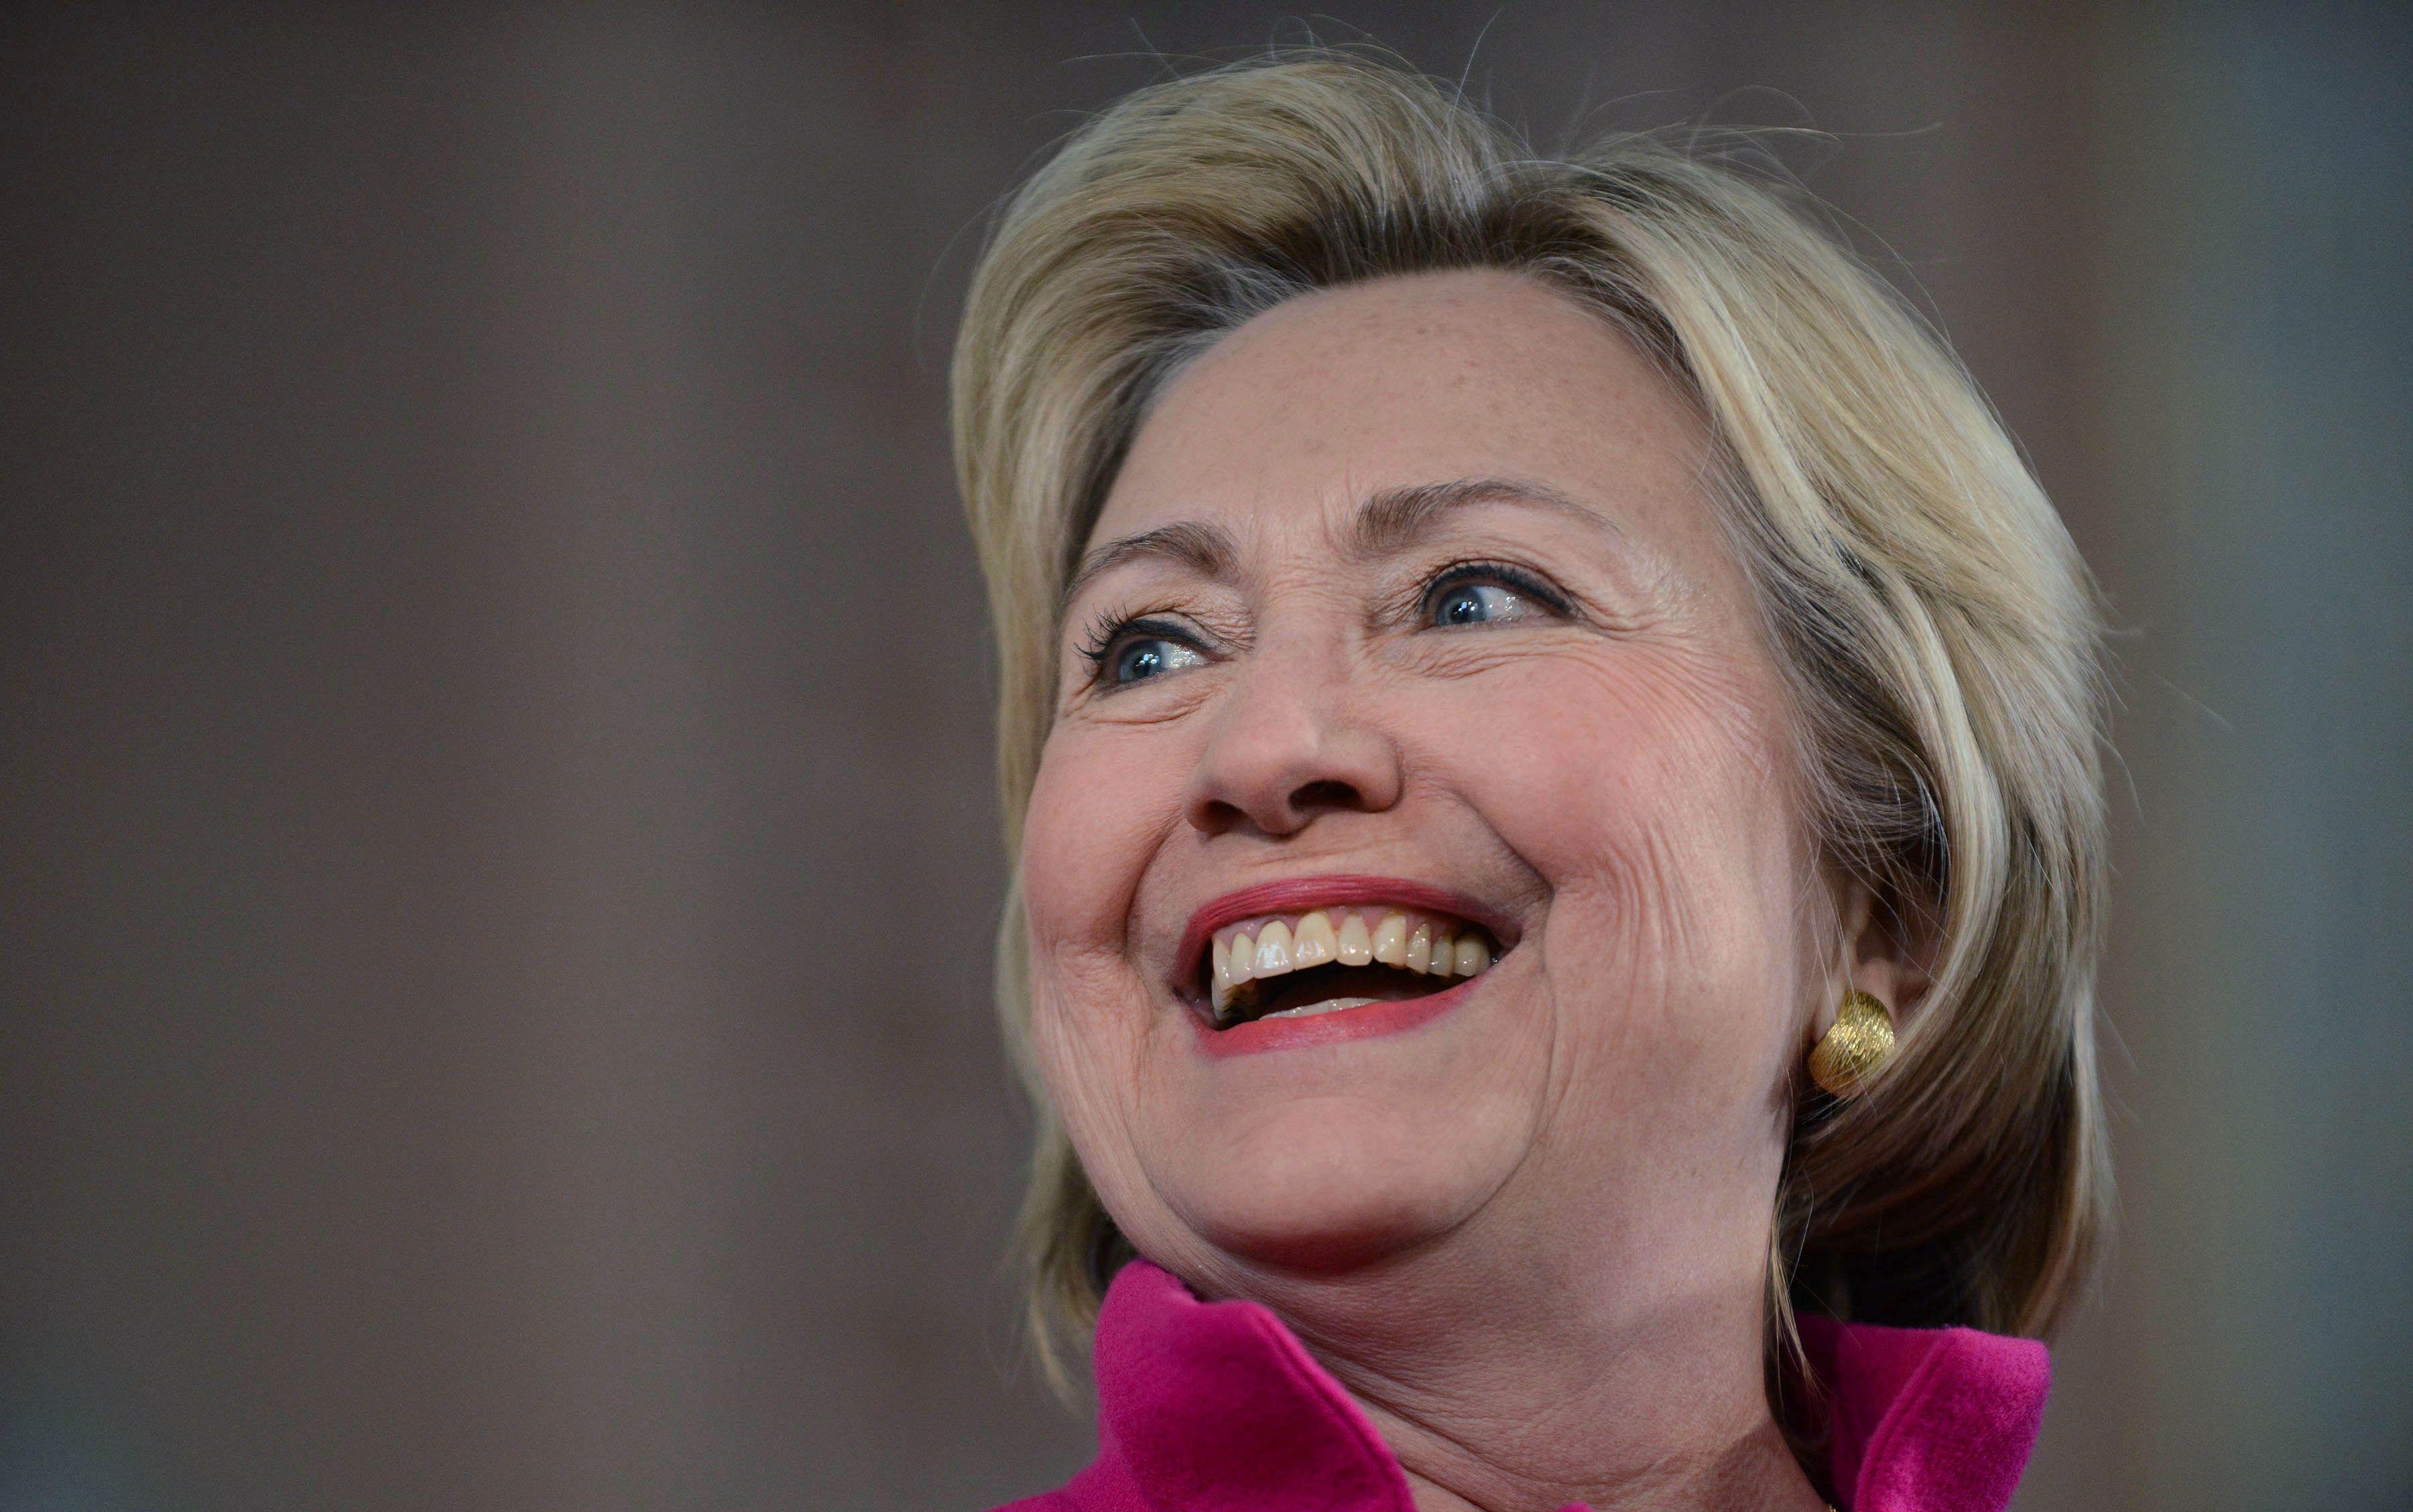 Hillary Clinton 21 Background Wallpaper